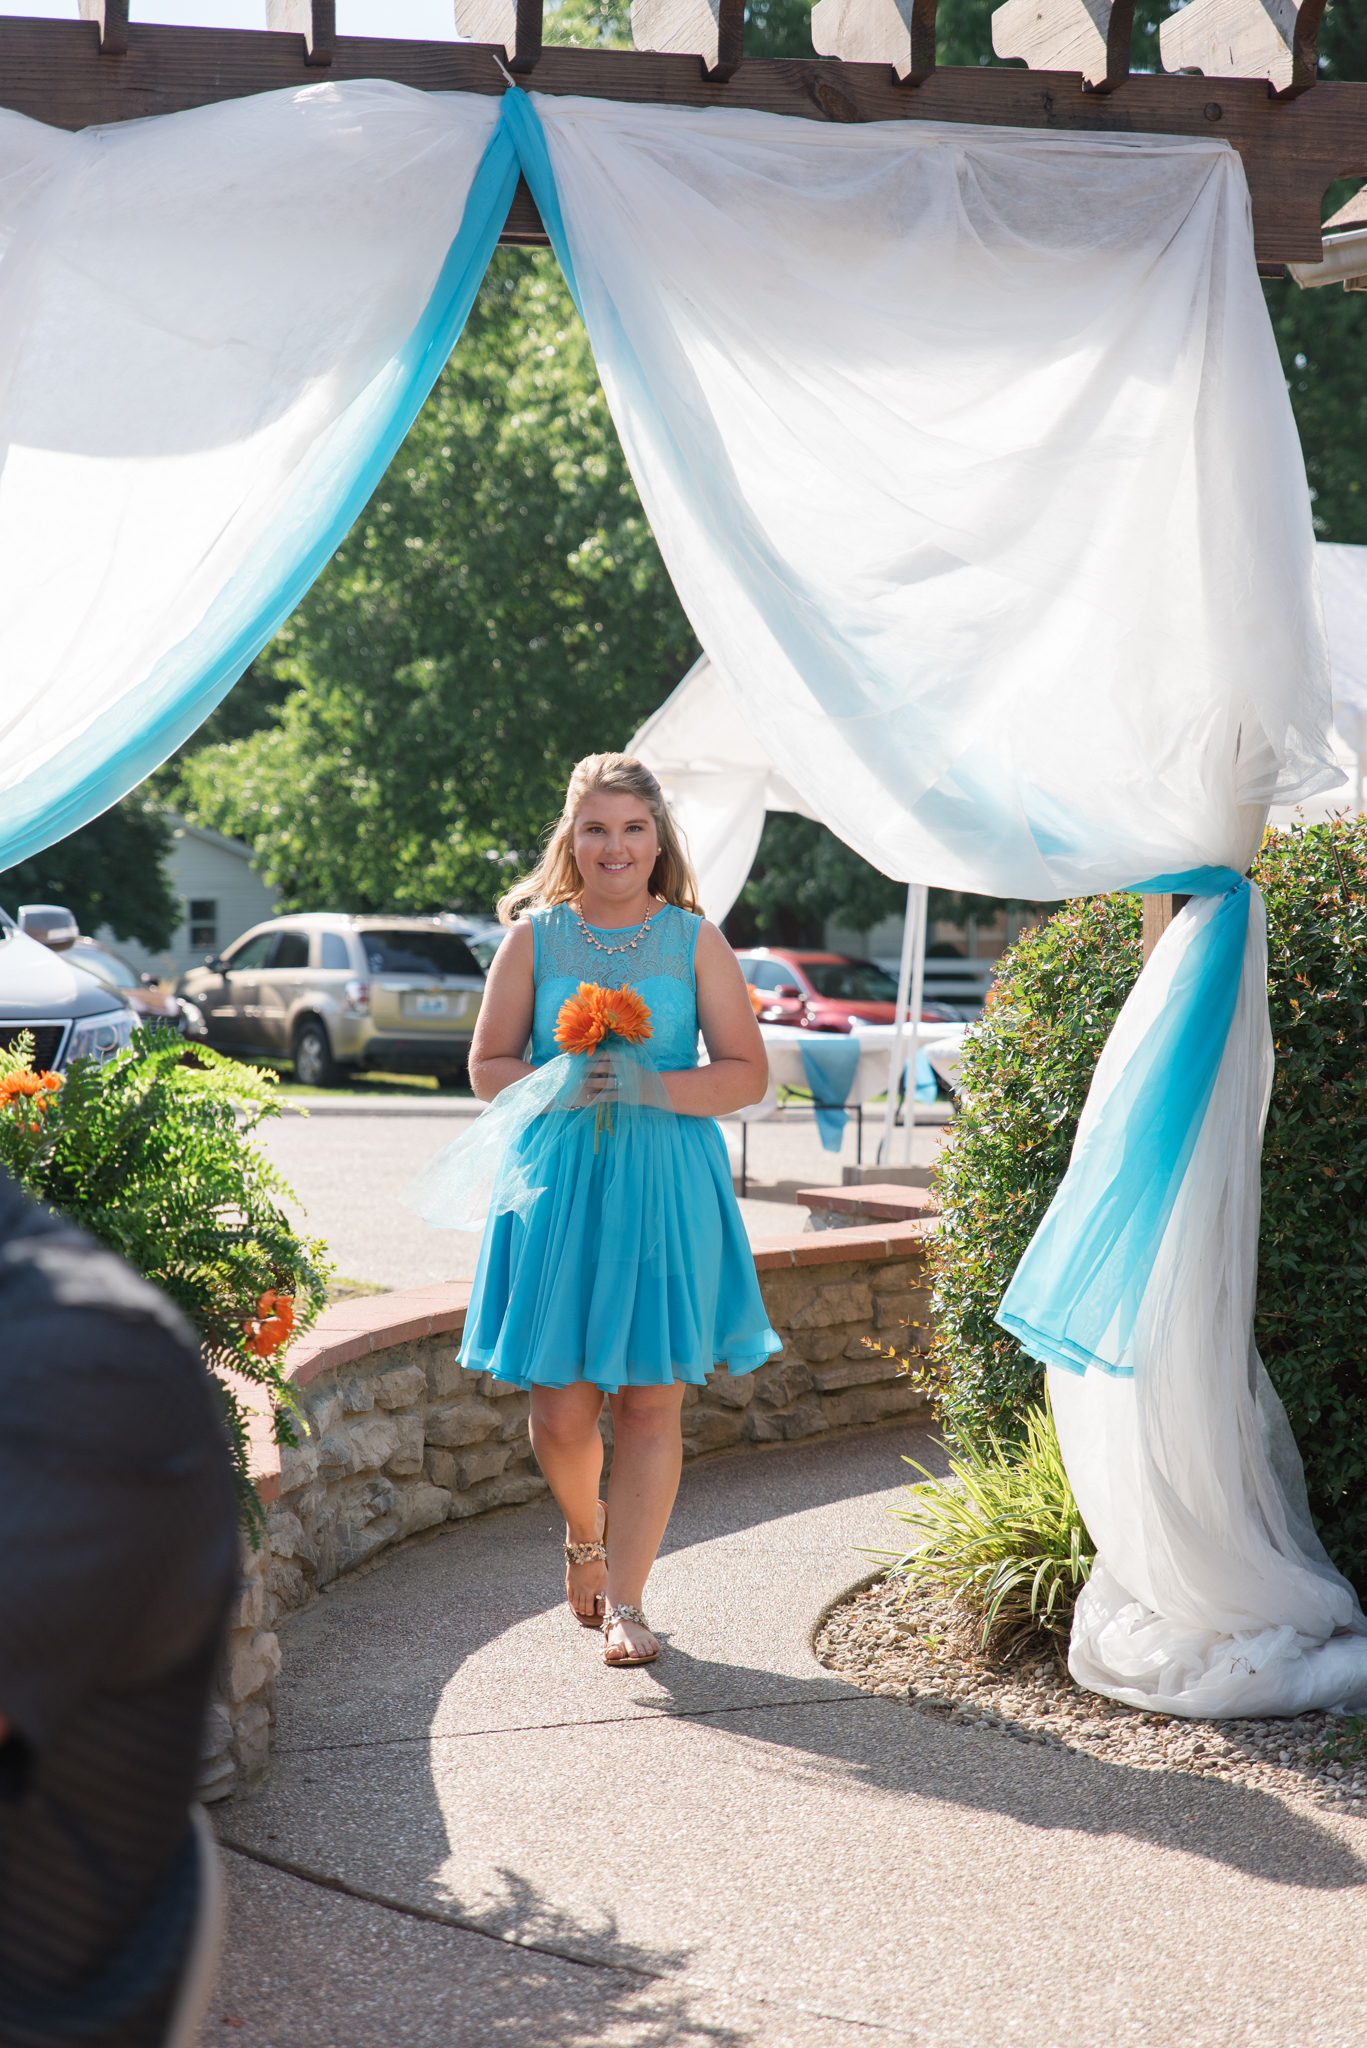 Winchester KY, Winchester KY photographer, KY Bride, Kentucky wedding